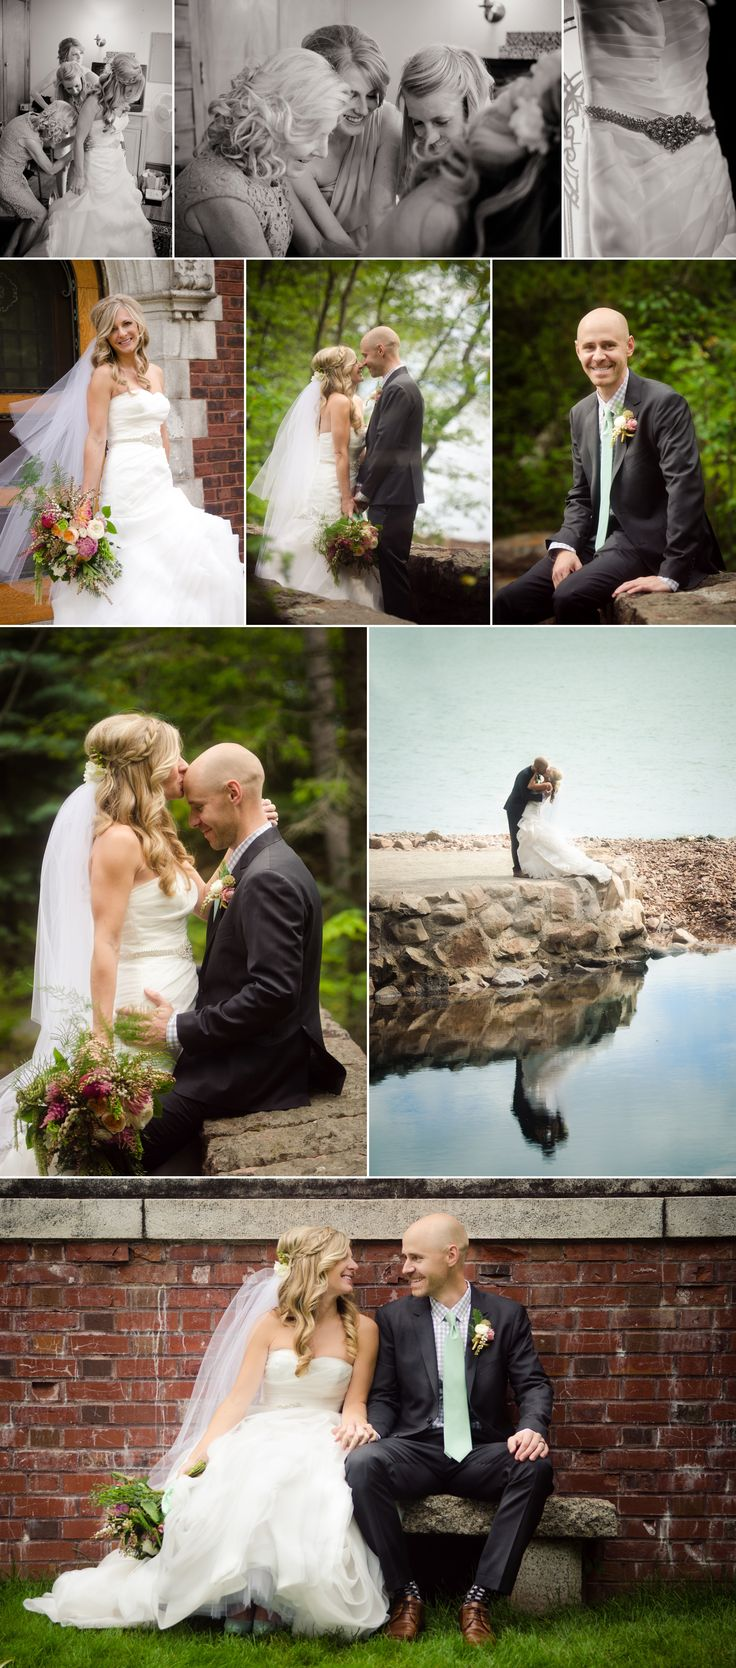 Angela Kissell Photography, Glensheen Mansion Wedding, Duluth Wedding on Lake Superior, Fall Lake Superior Wedding, Fall Duluth Wedding